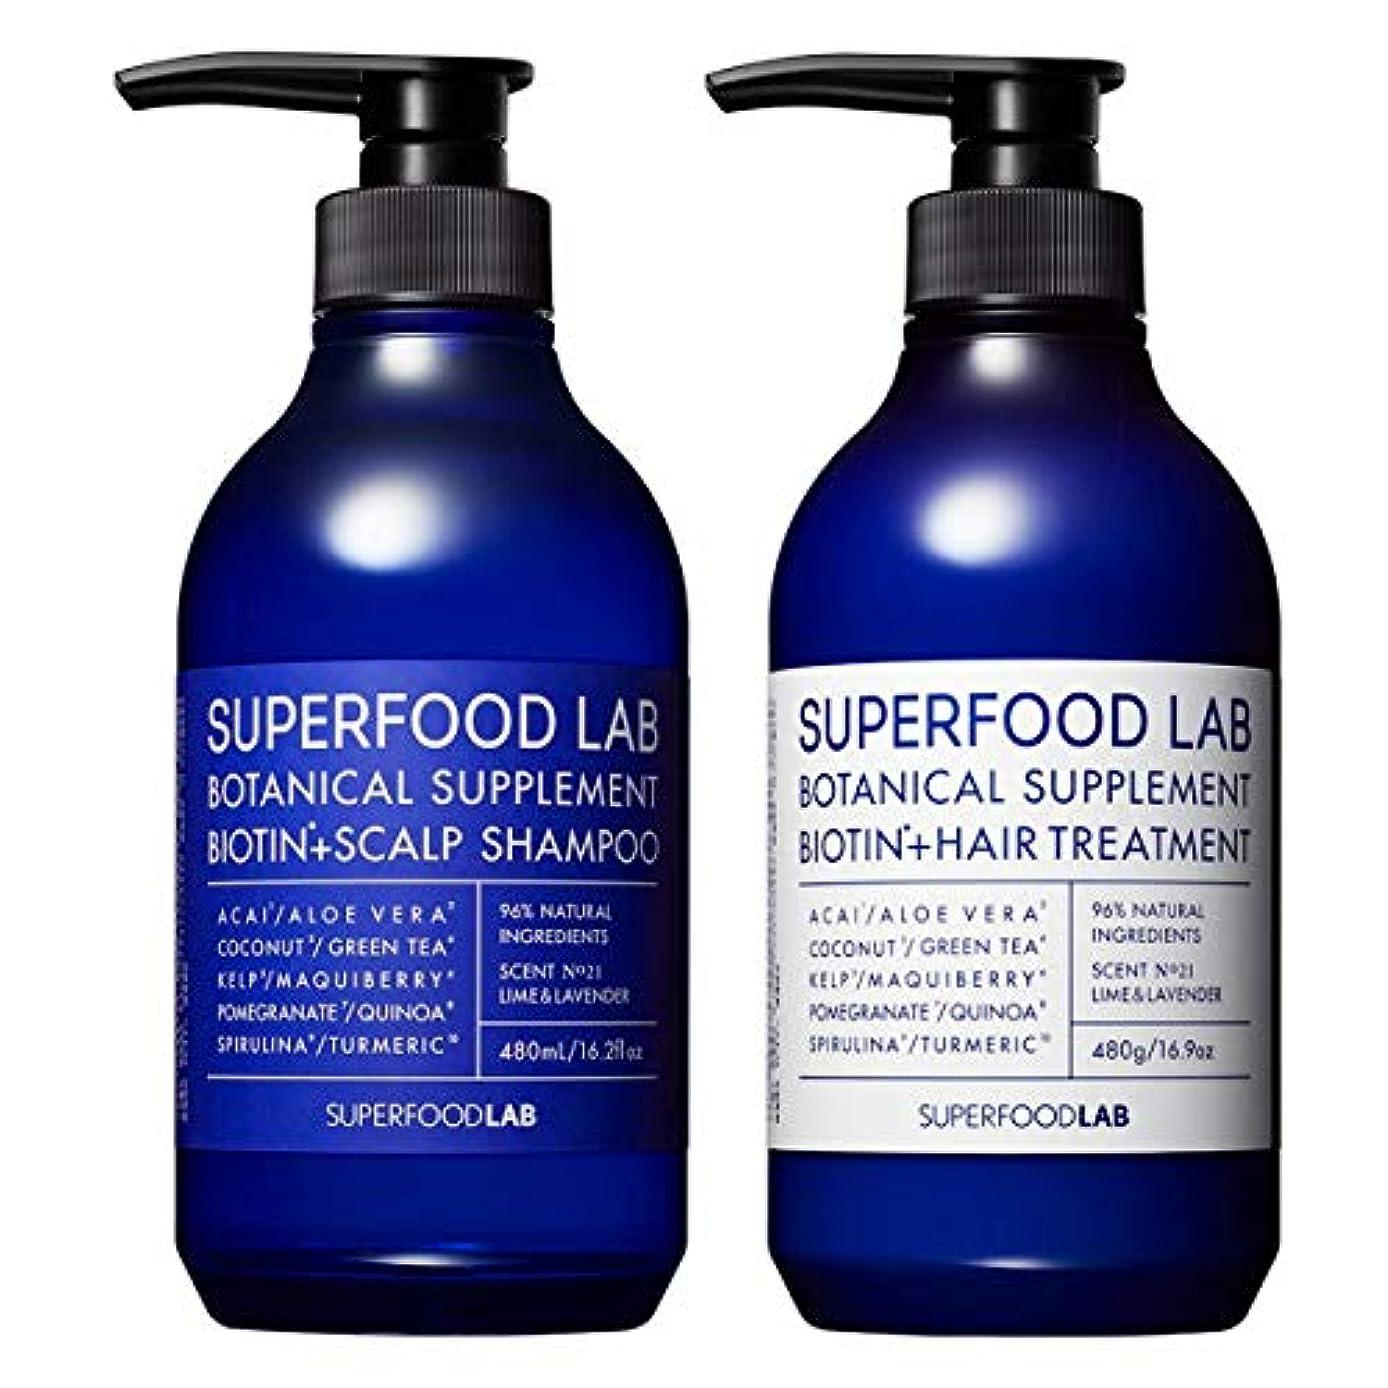 SUPERFOOD LAB BIOTIN + SCALP SHAMPOO & TREATMENT